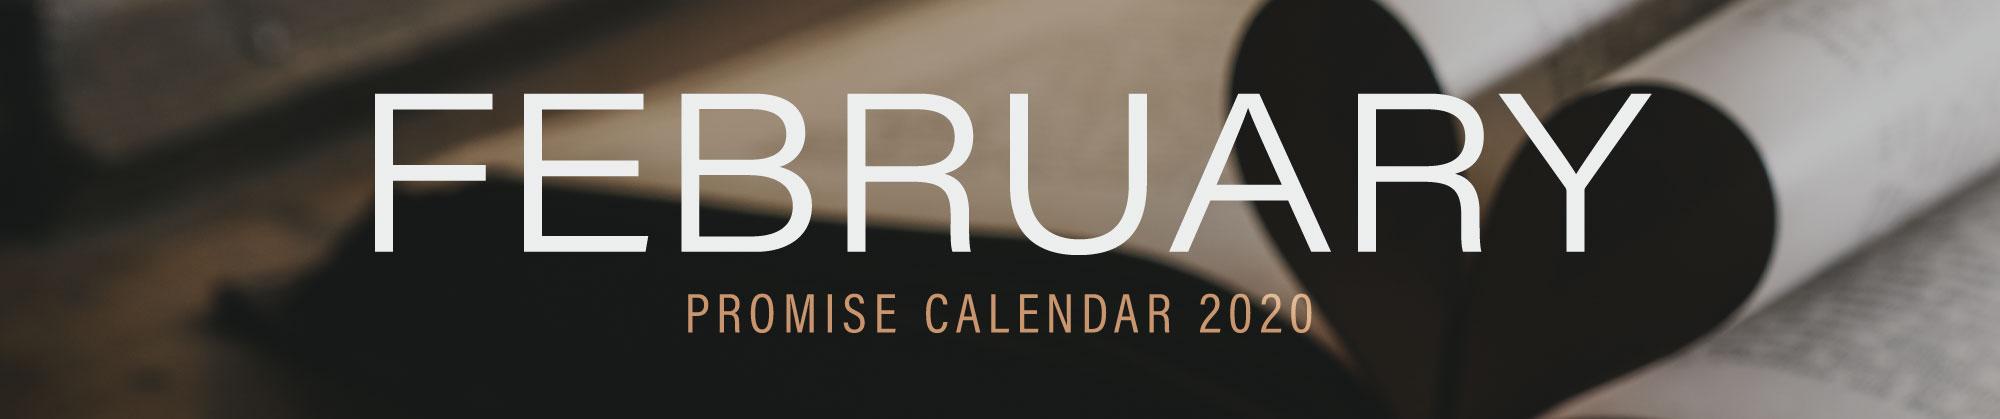 February 2020 Promise Calendar